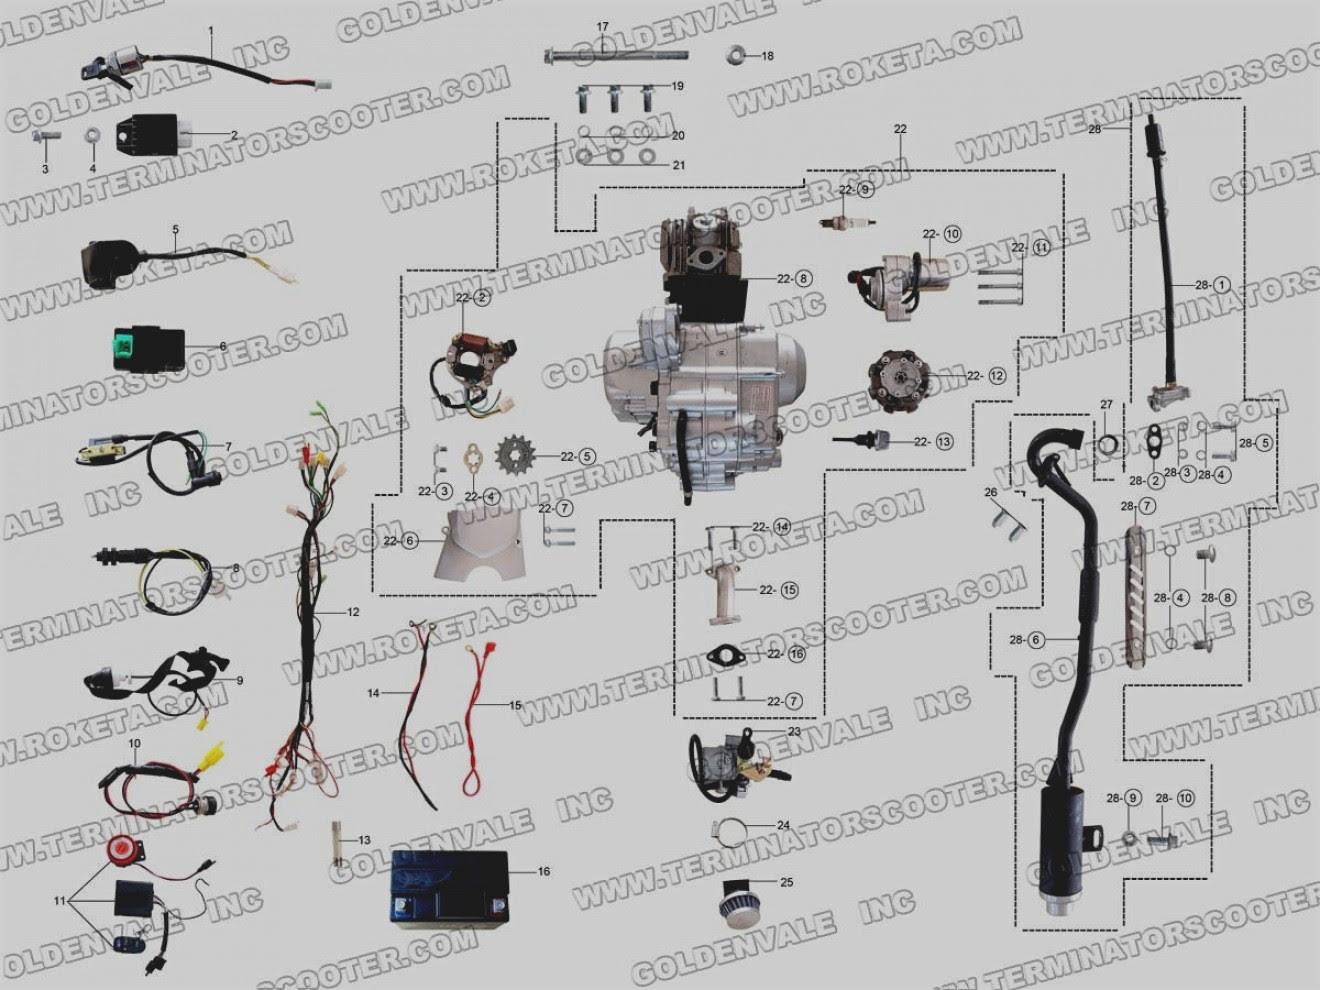 107cc Atv Wiring Diagram 1995 Jeep Wrangler Fuel Pump Wiring Diagram Toyota Tps Holden Commodore Jeanjaures37 Fr